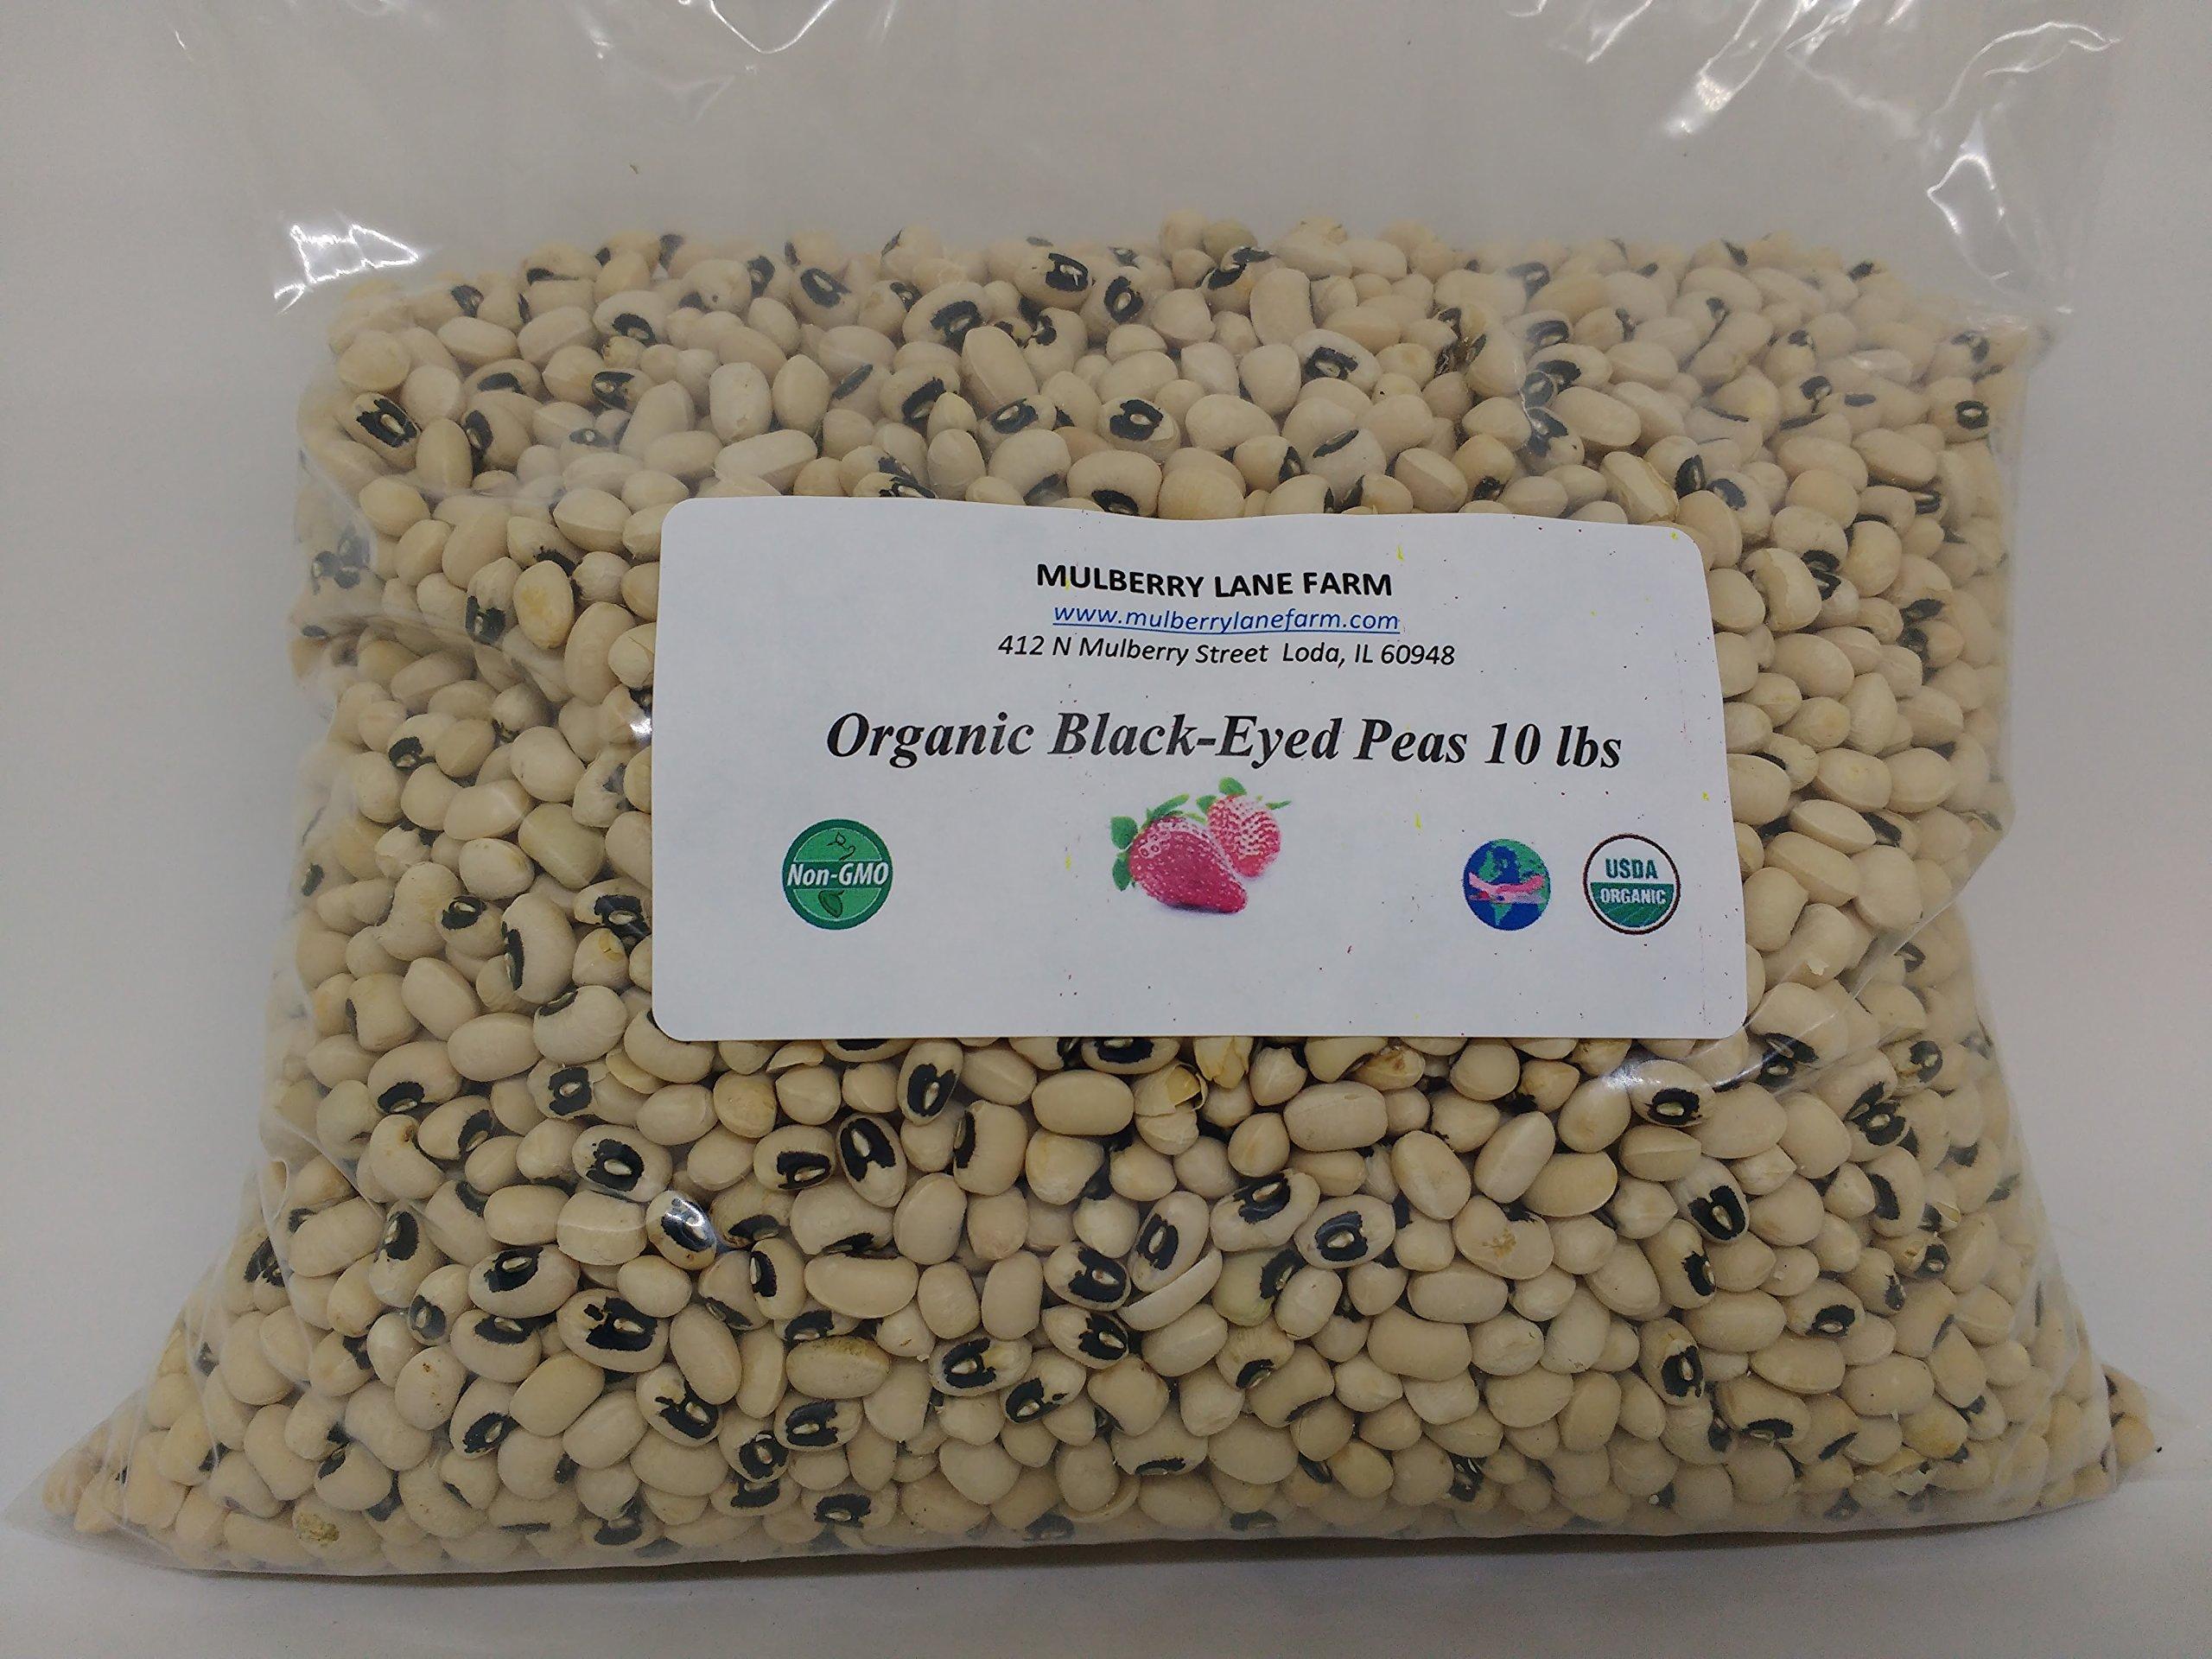 Black-eyed Peas (Beans), 10 lbs (ten pounds), Dried, USDA Certified Organic, Non-GMO, Ships BULK.